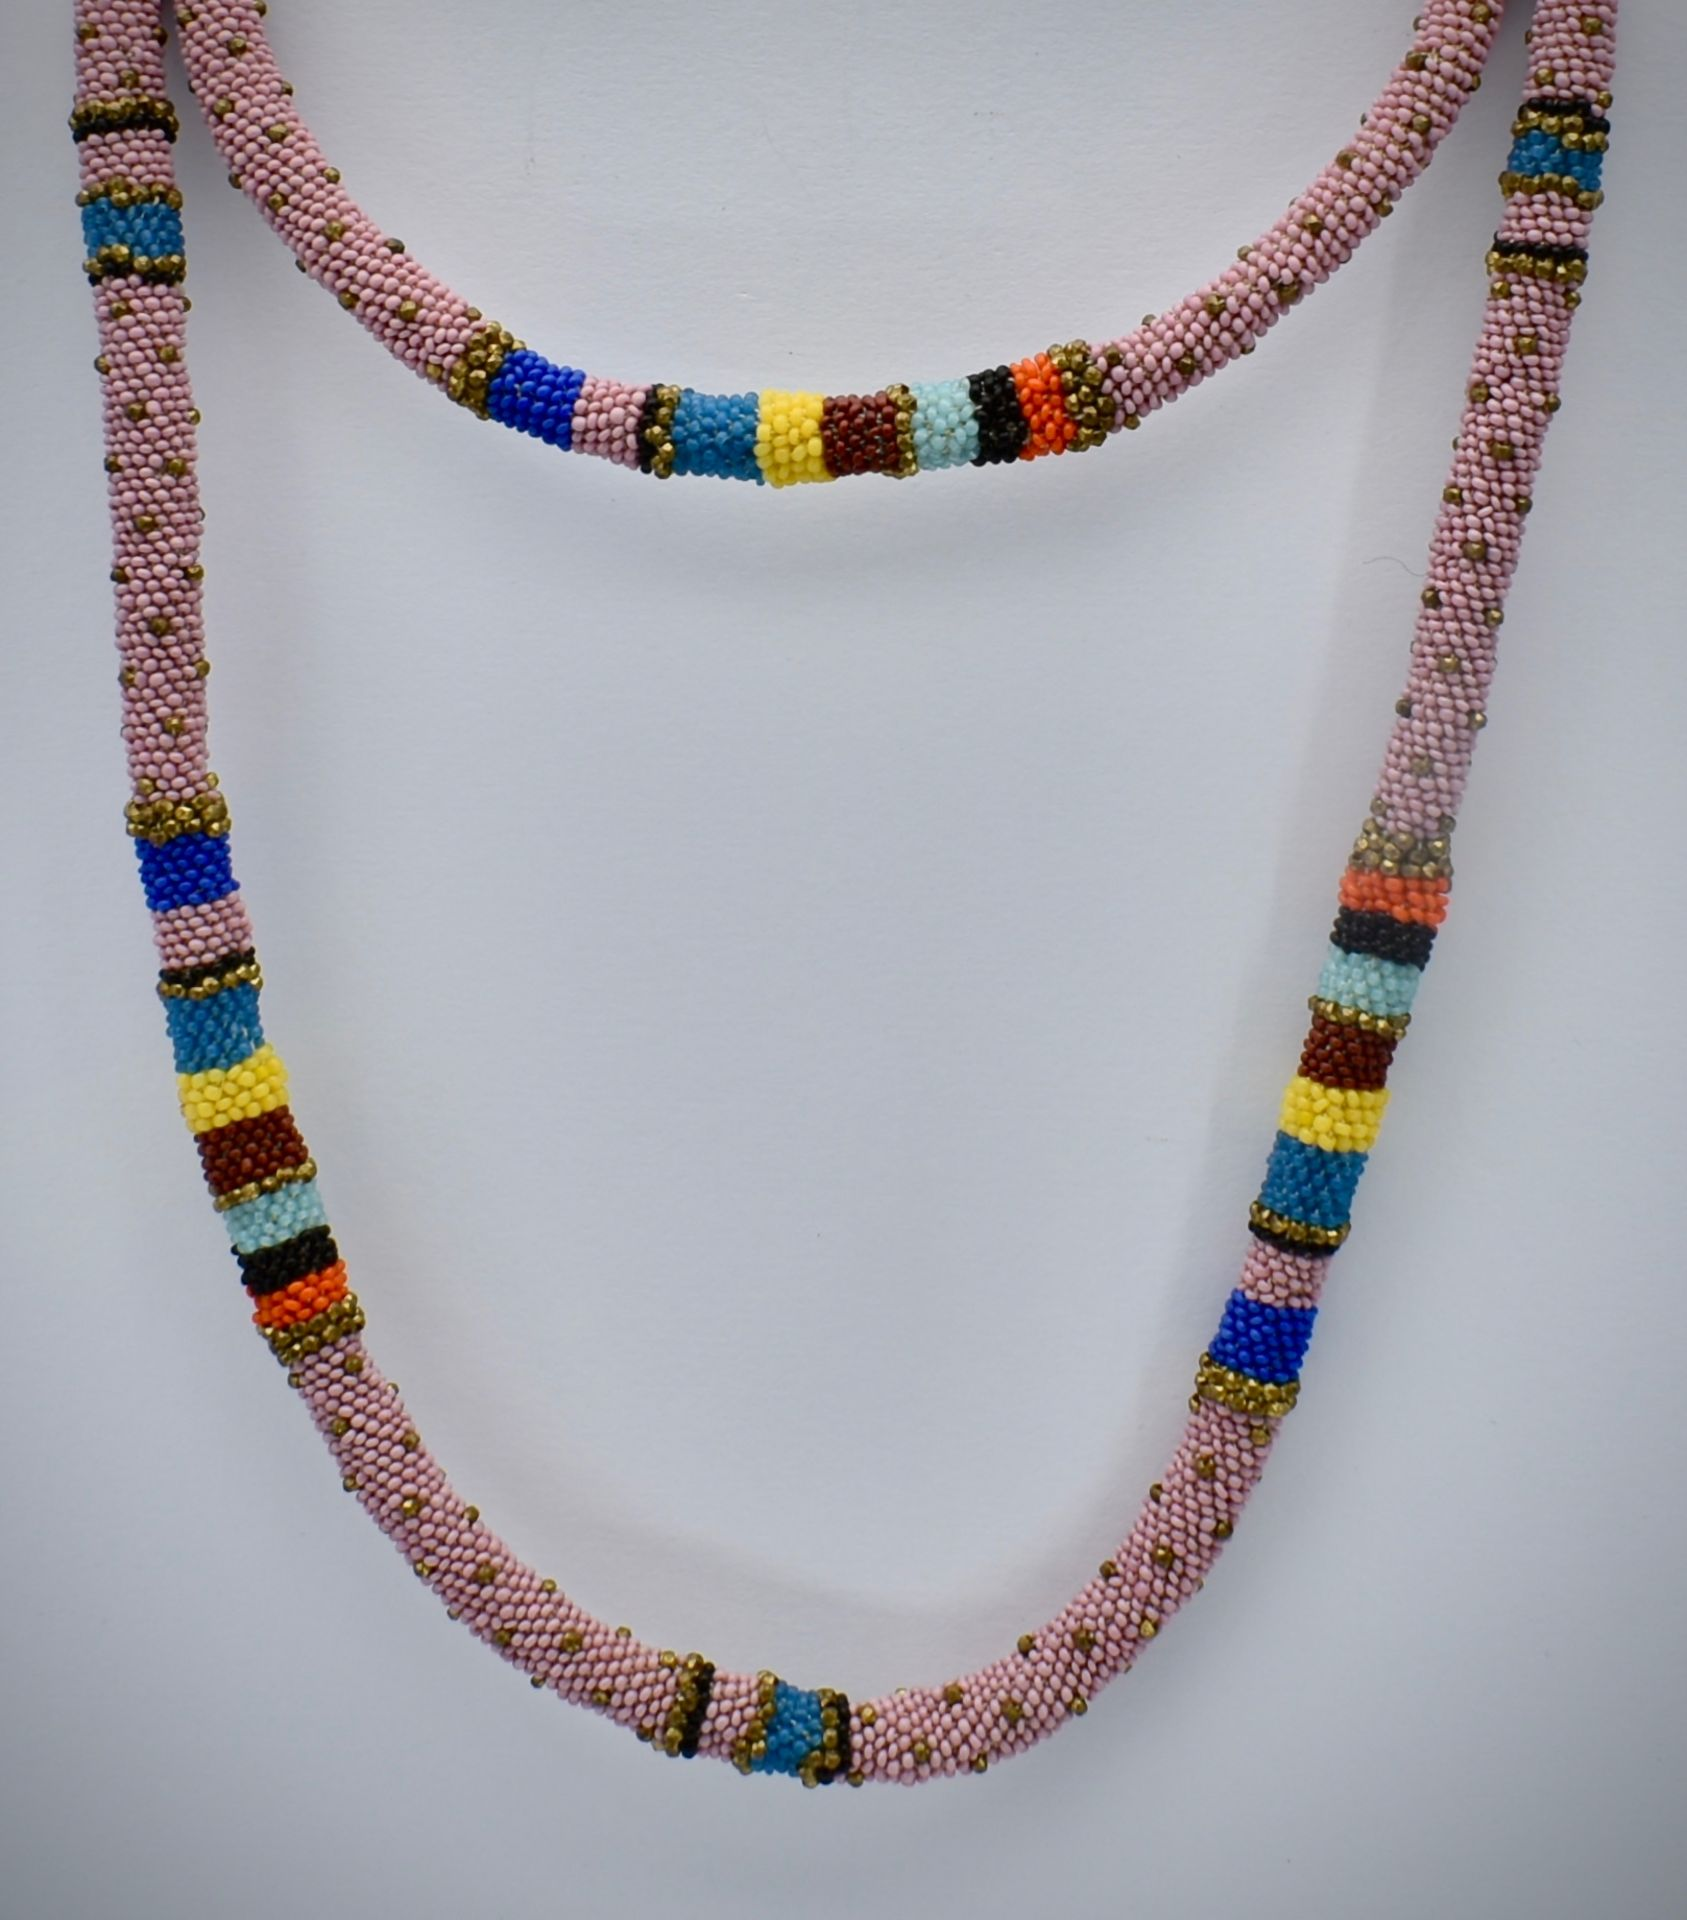 Wiener Werkstätte Micro-Beaded Necklace